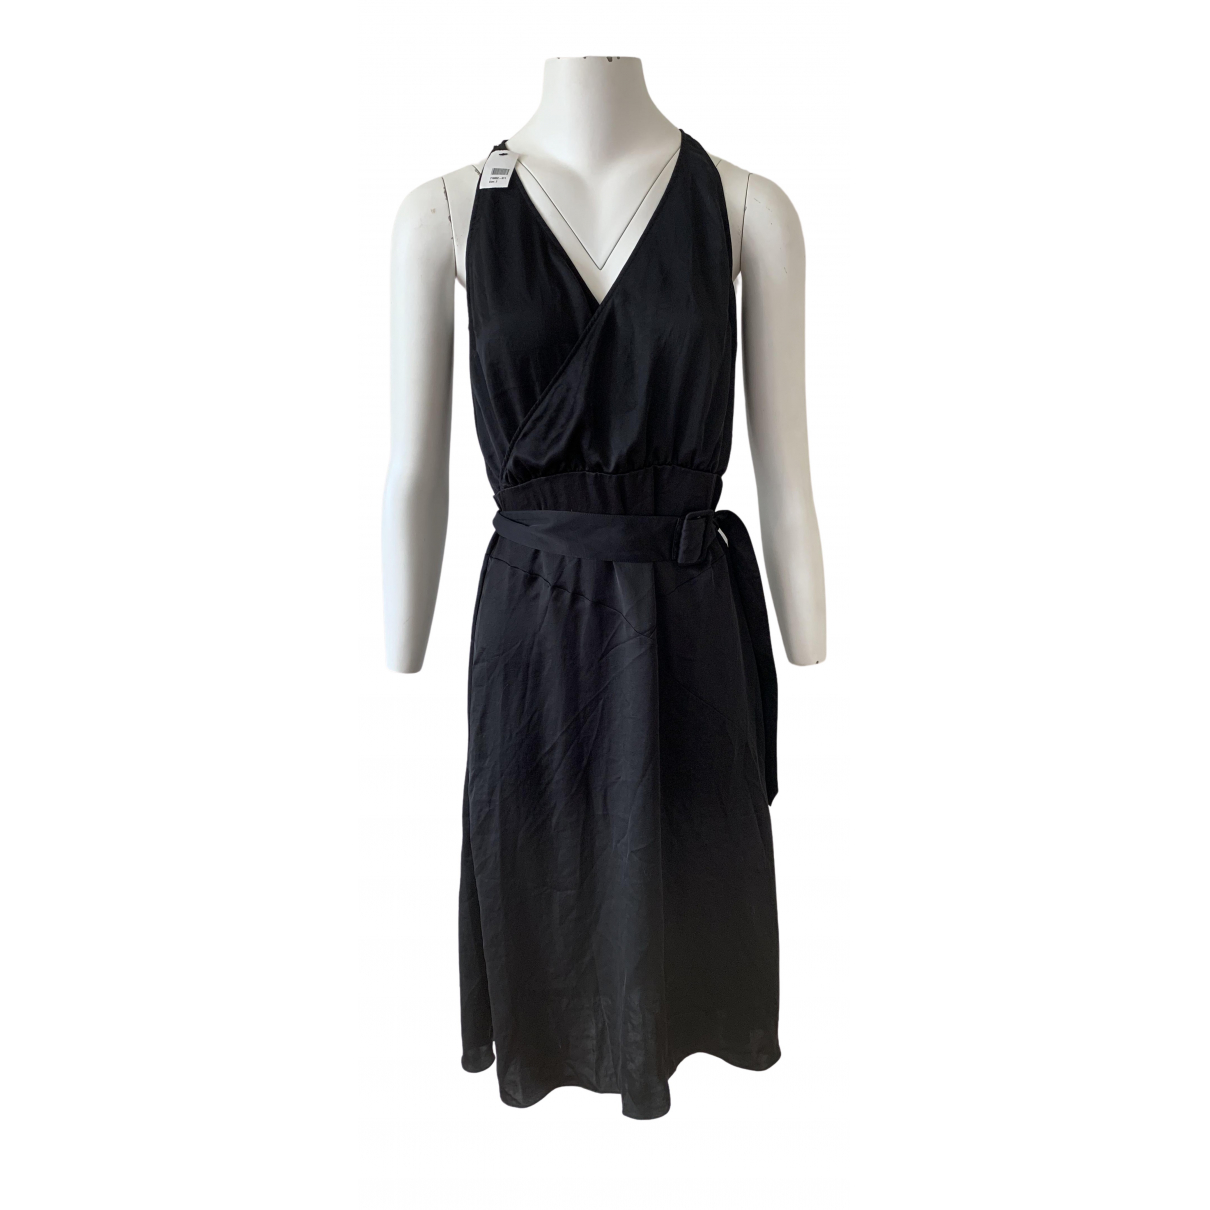 Tomas Maier N Black Silk dress for Women 2 US